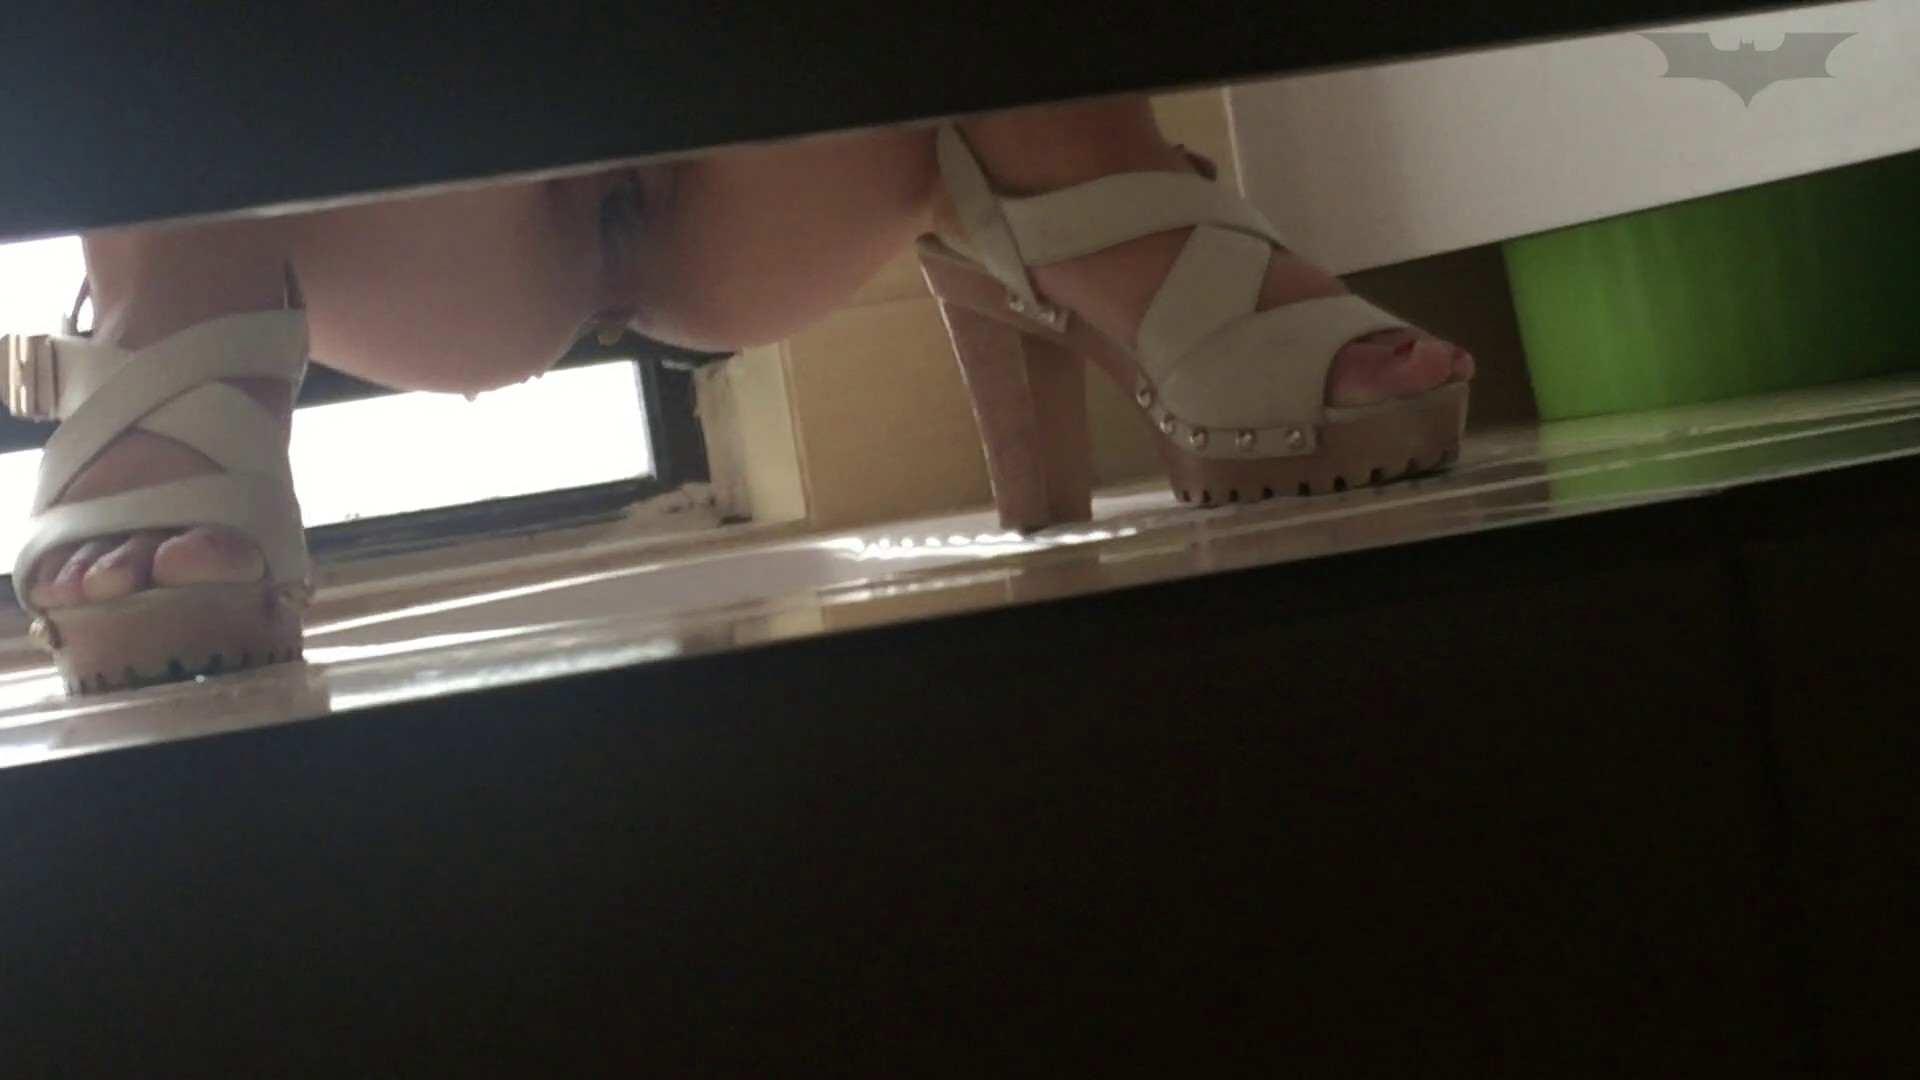 JD盗撮 美女の洗面所の秘密 Vol.73 高画質動画 AV無料動画キャプチャ 67画像 6